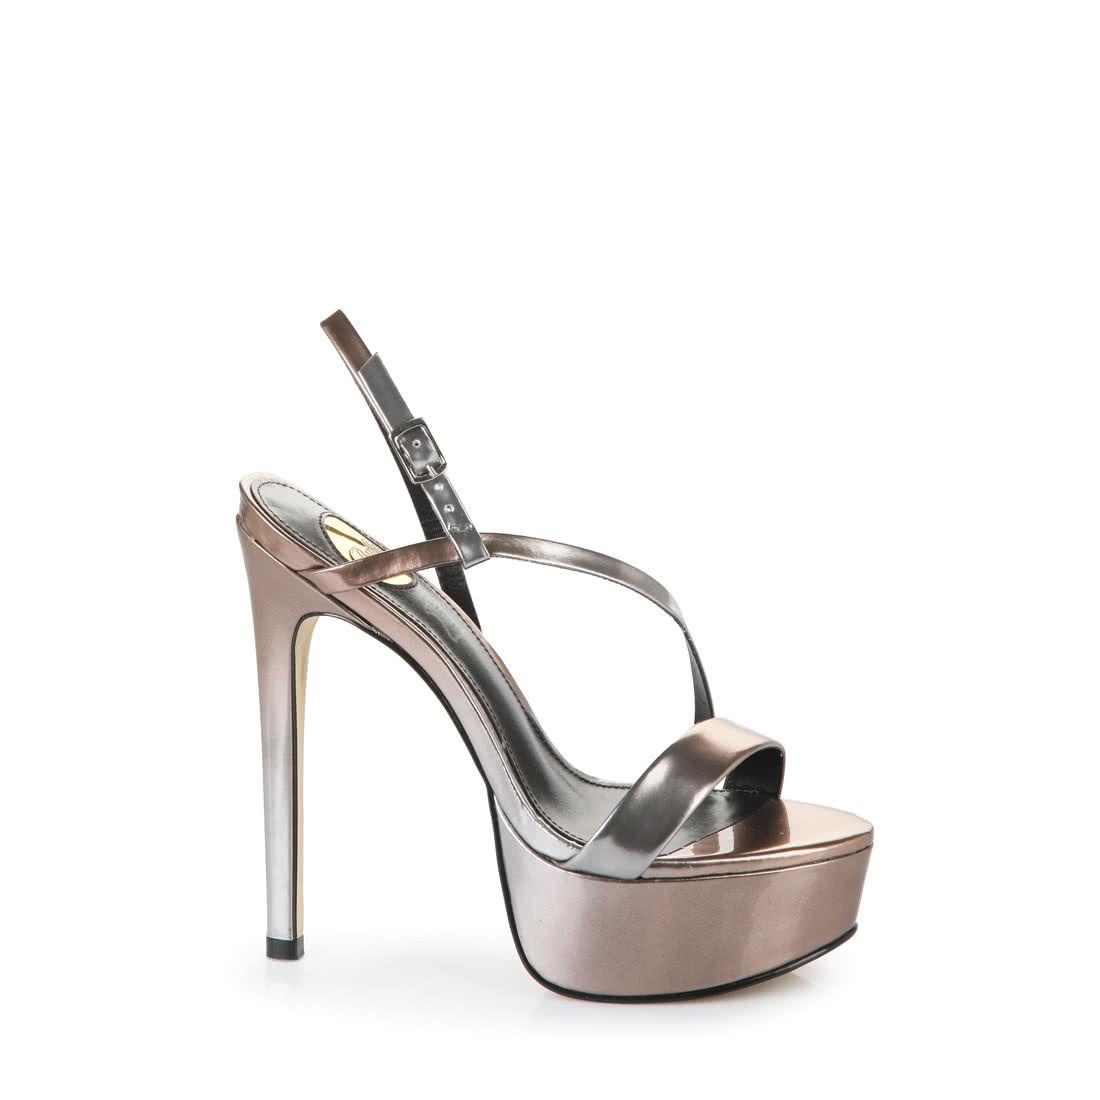 d03ea968e8 BUFFALO Buffalo high-heeled sandals with platform toe in graduated  anthracite